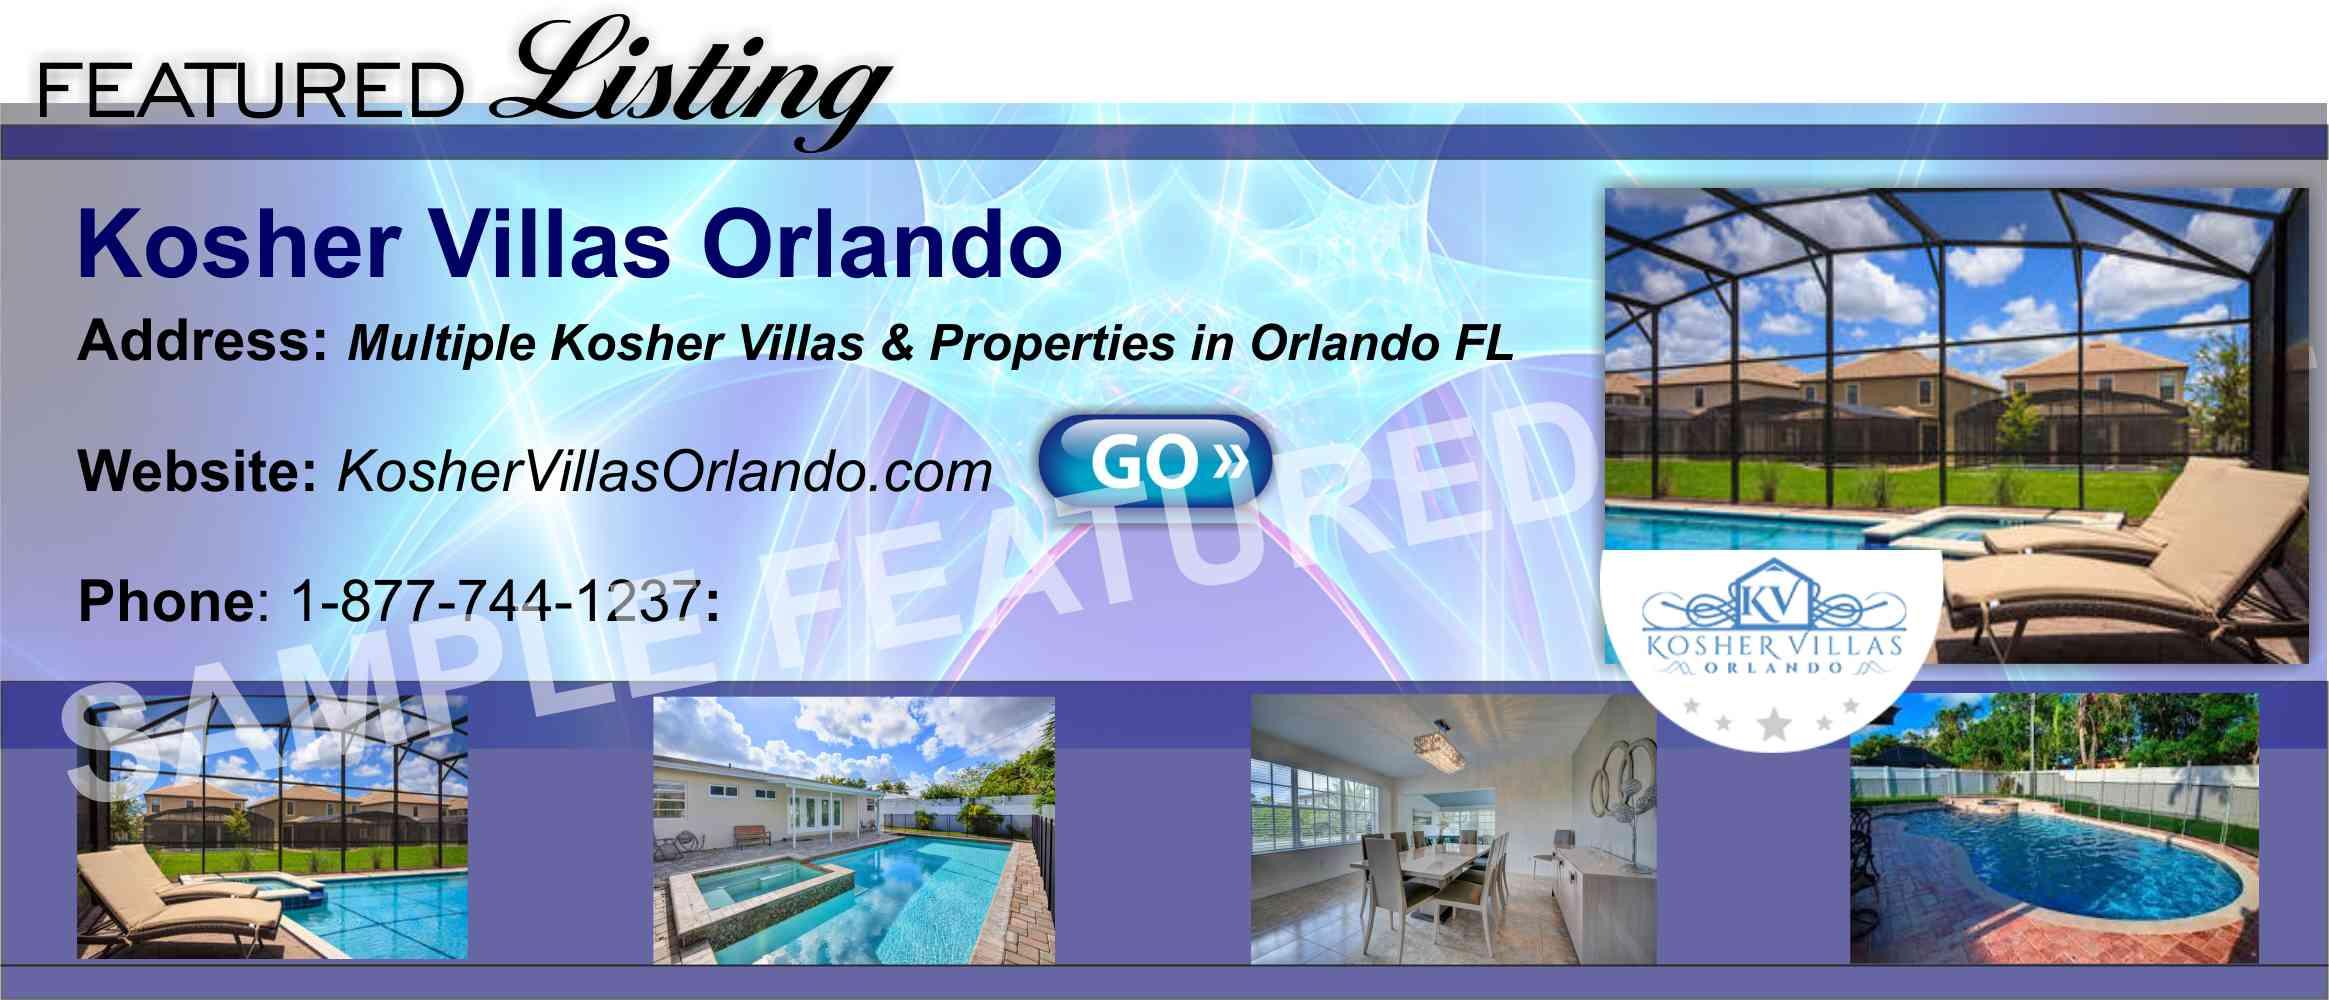 Florida Kosher Villas Orlando Koshervacationcentral Hotels Page